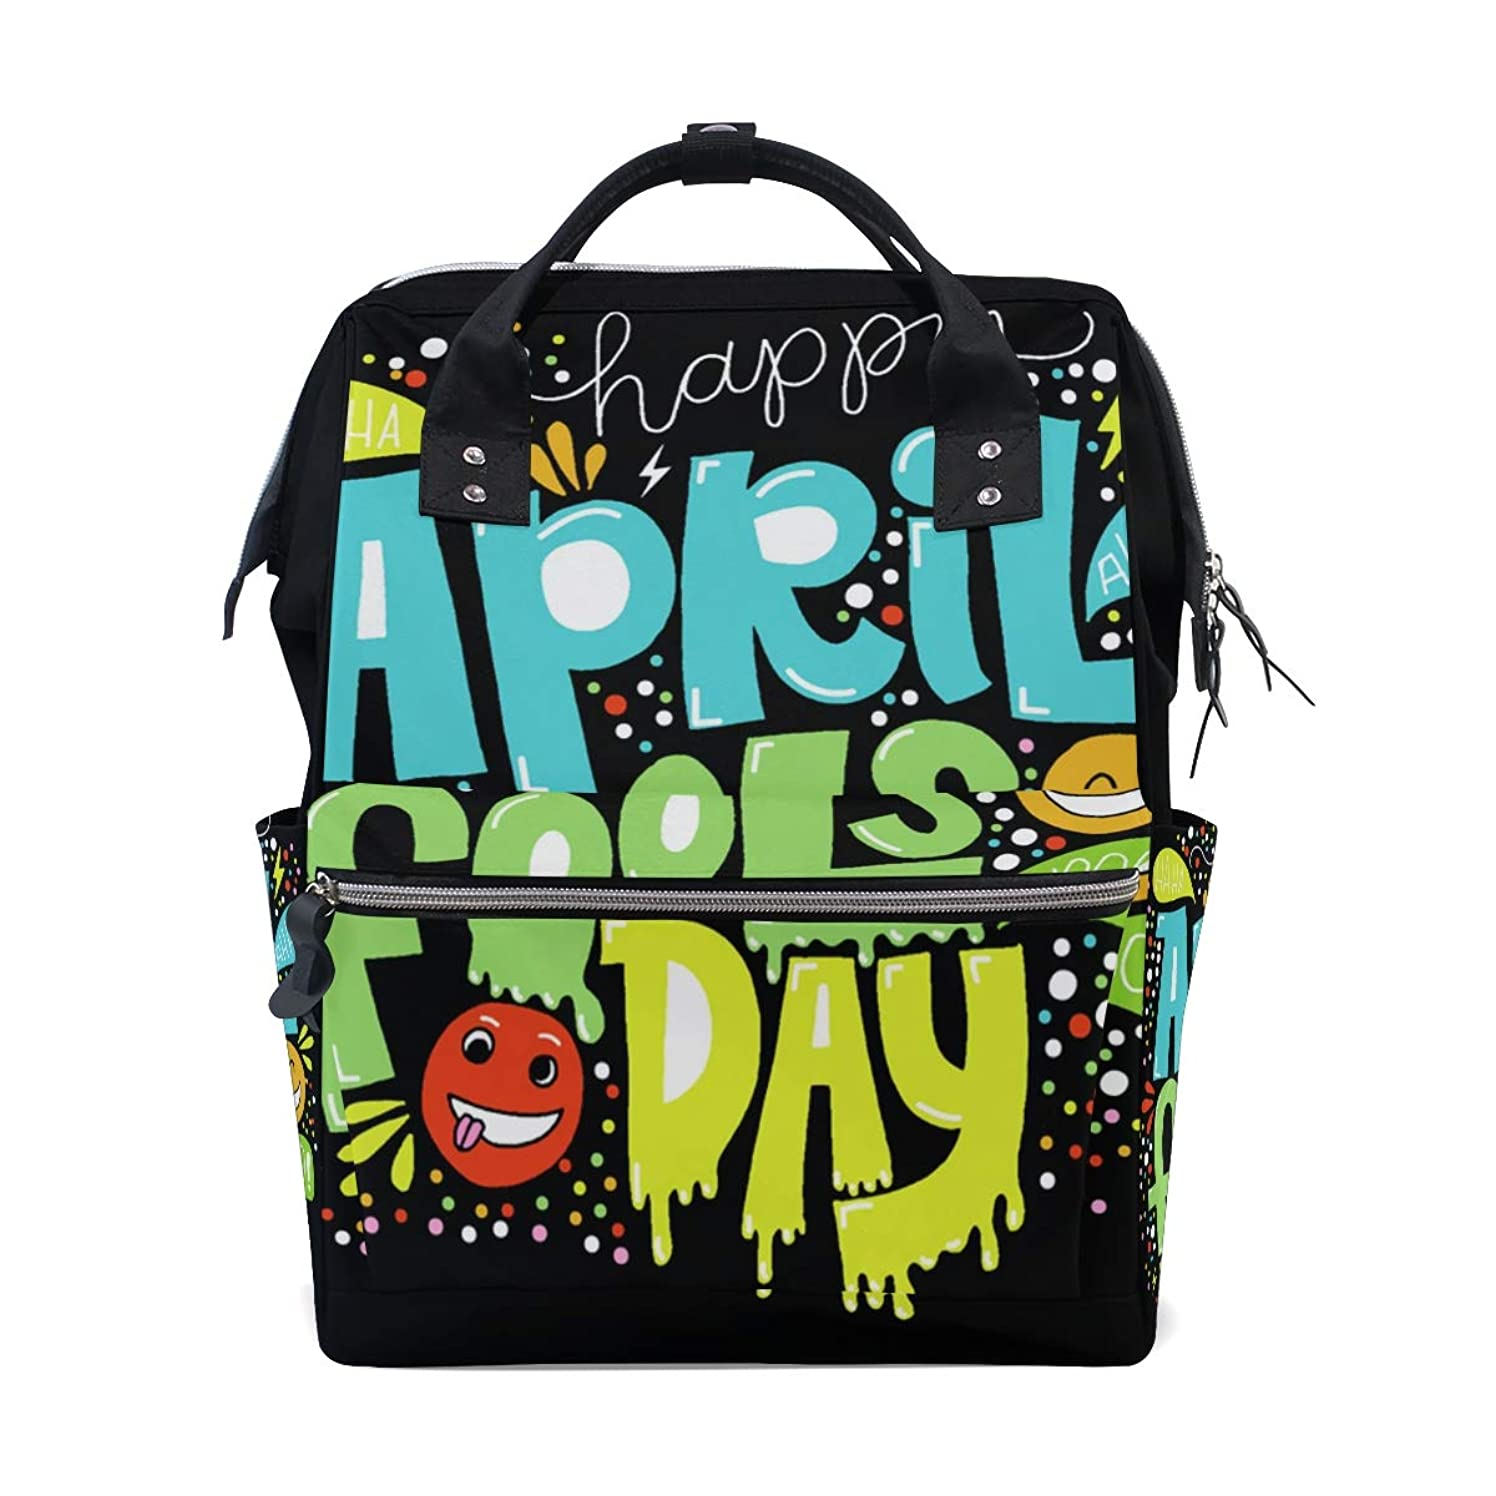 Happy April Fools Day School Backpack Large Capacity Mummy Bags Laptop Handbag Casual Travel Rucksack Satchel For Women Men Adult Teen Children